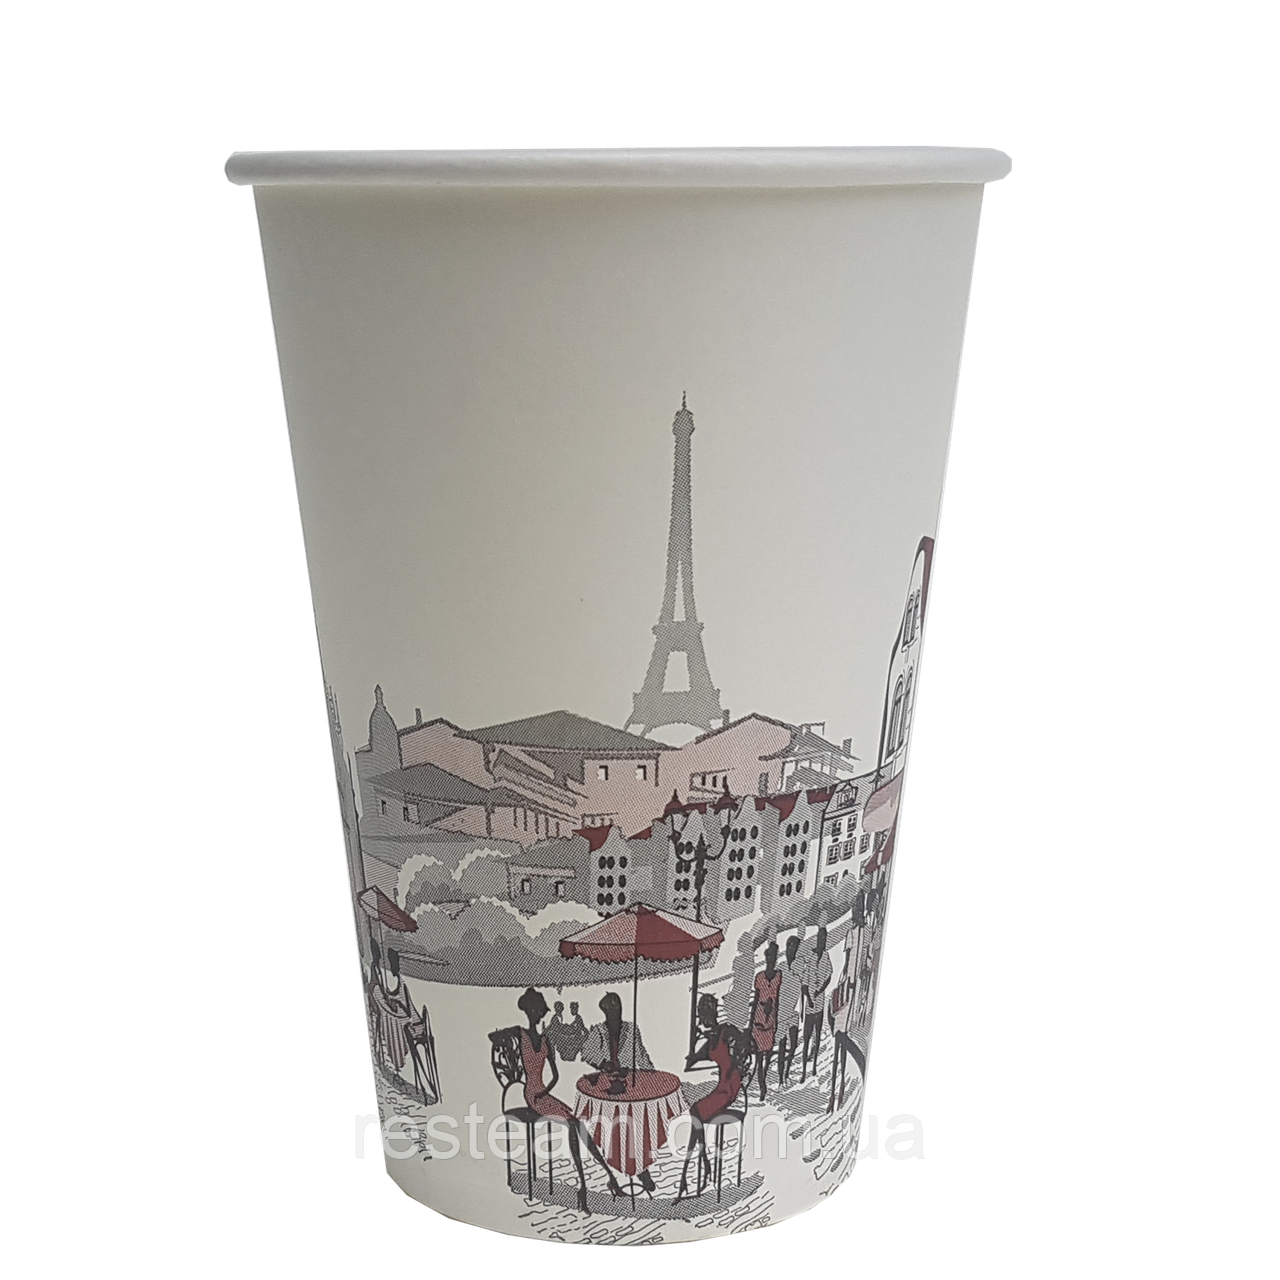 Стакан одноразовый бумажный чайный 340мл Ж, 50шт/уп